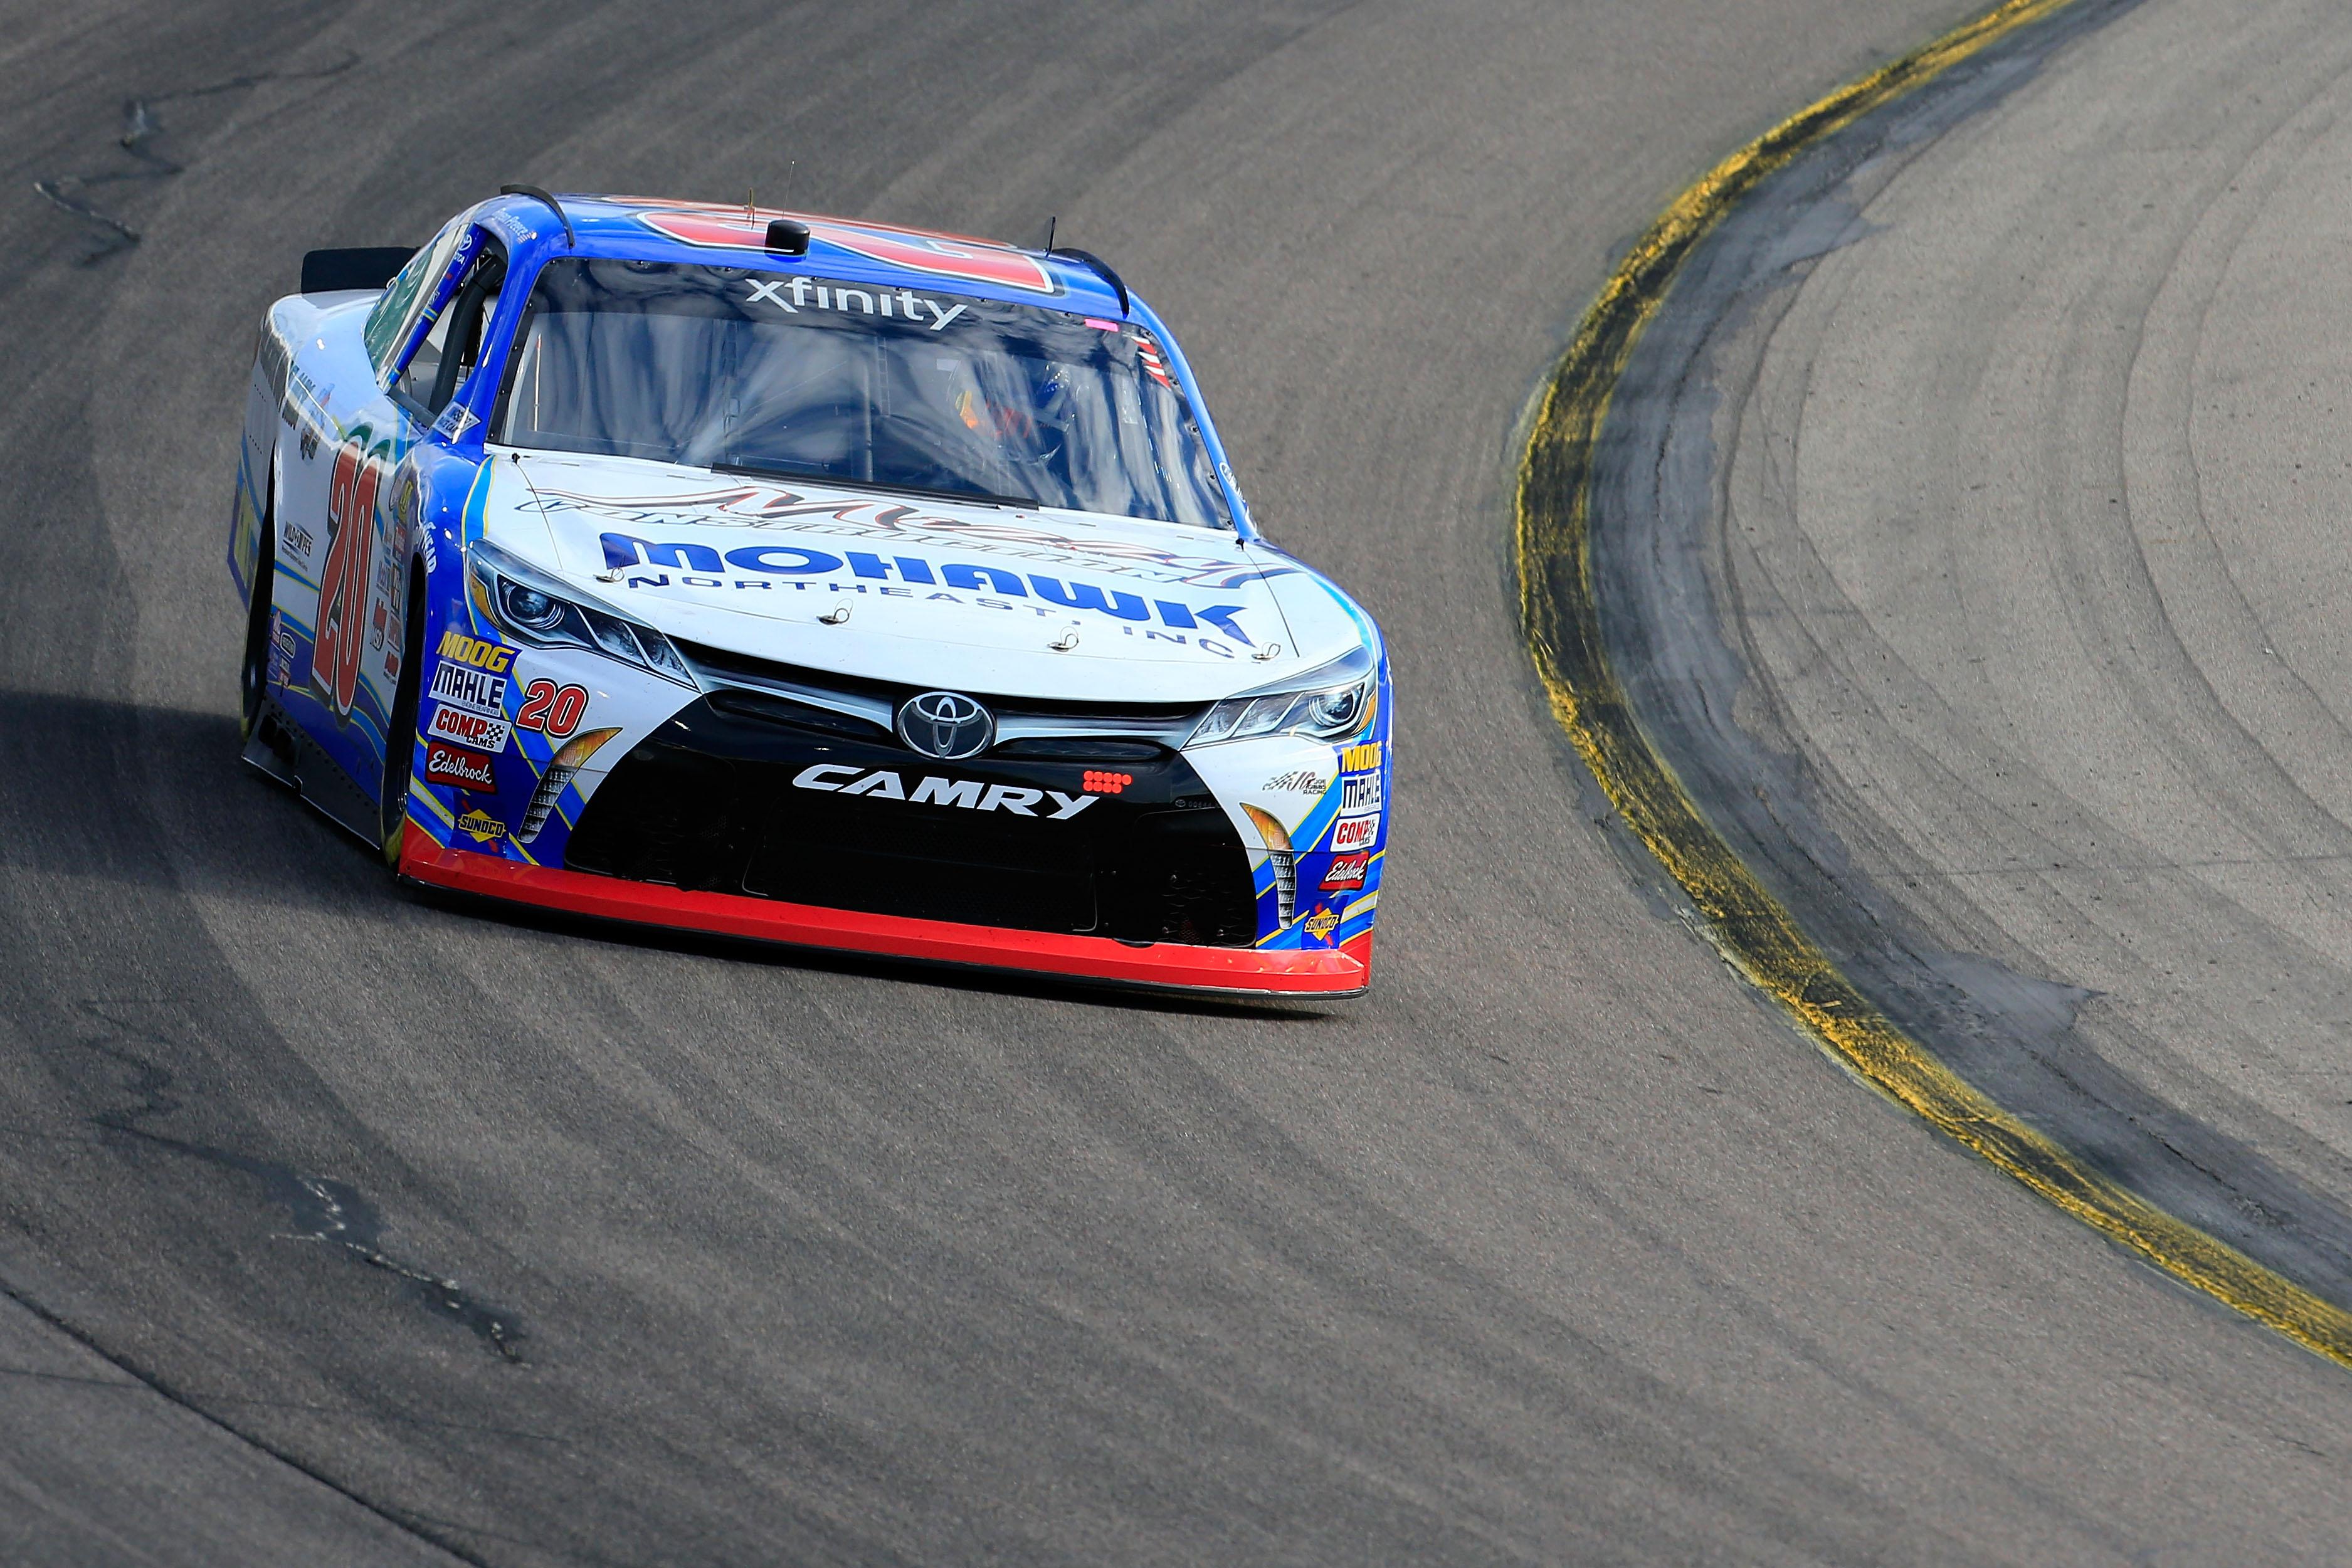 Iowa Speedway Results - NASCAR Xfinity Series - Justin Allgaier